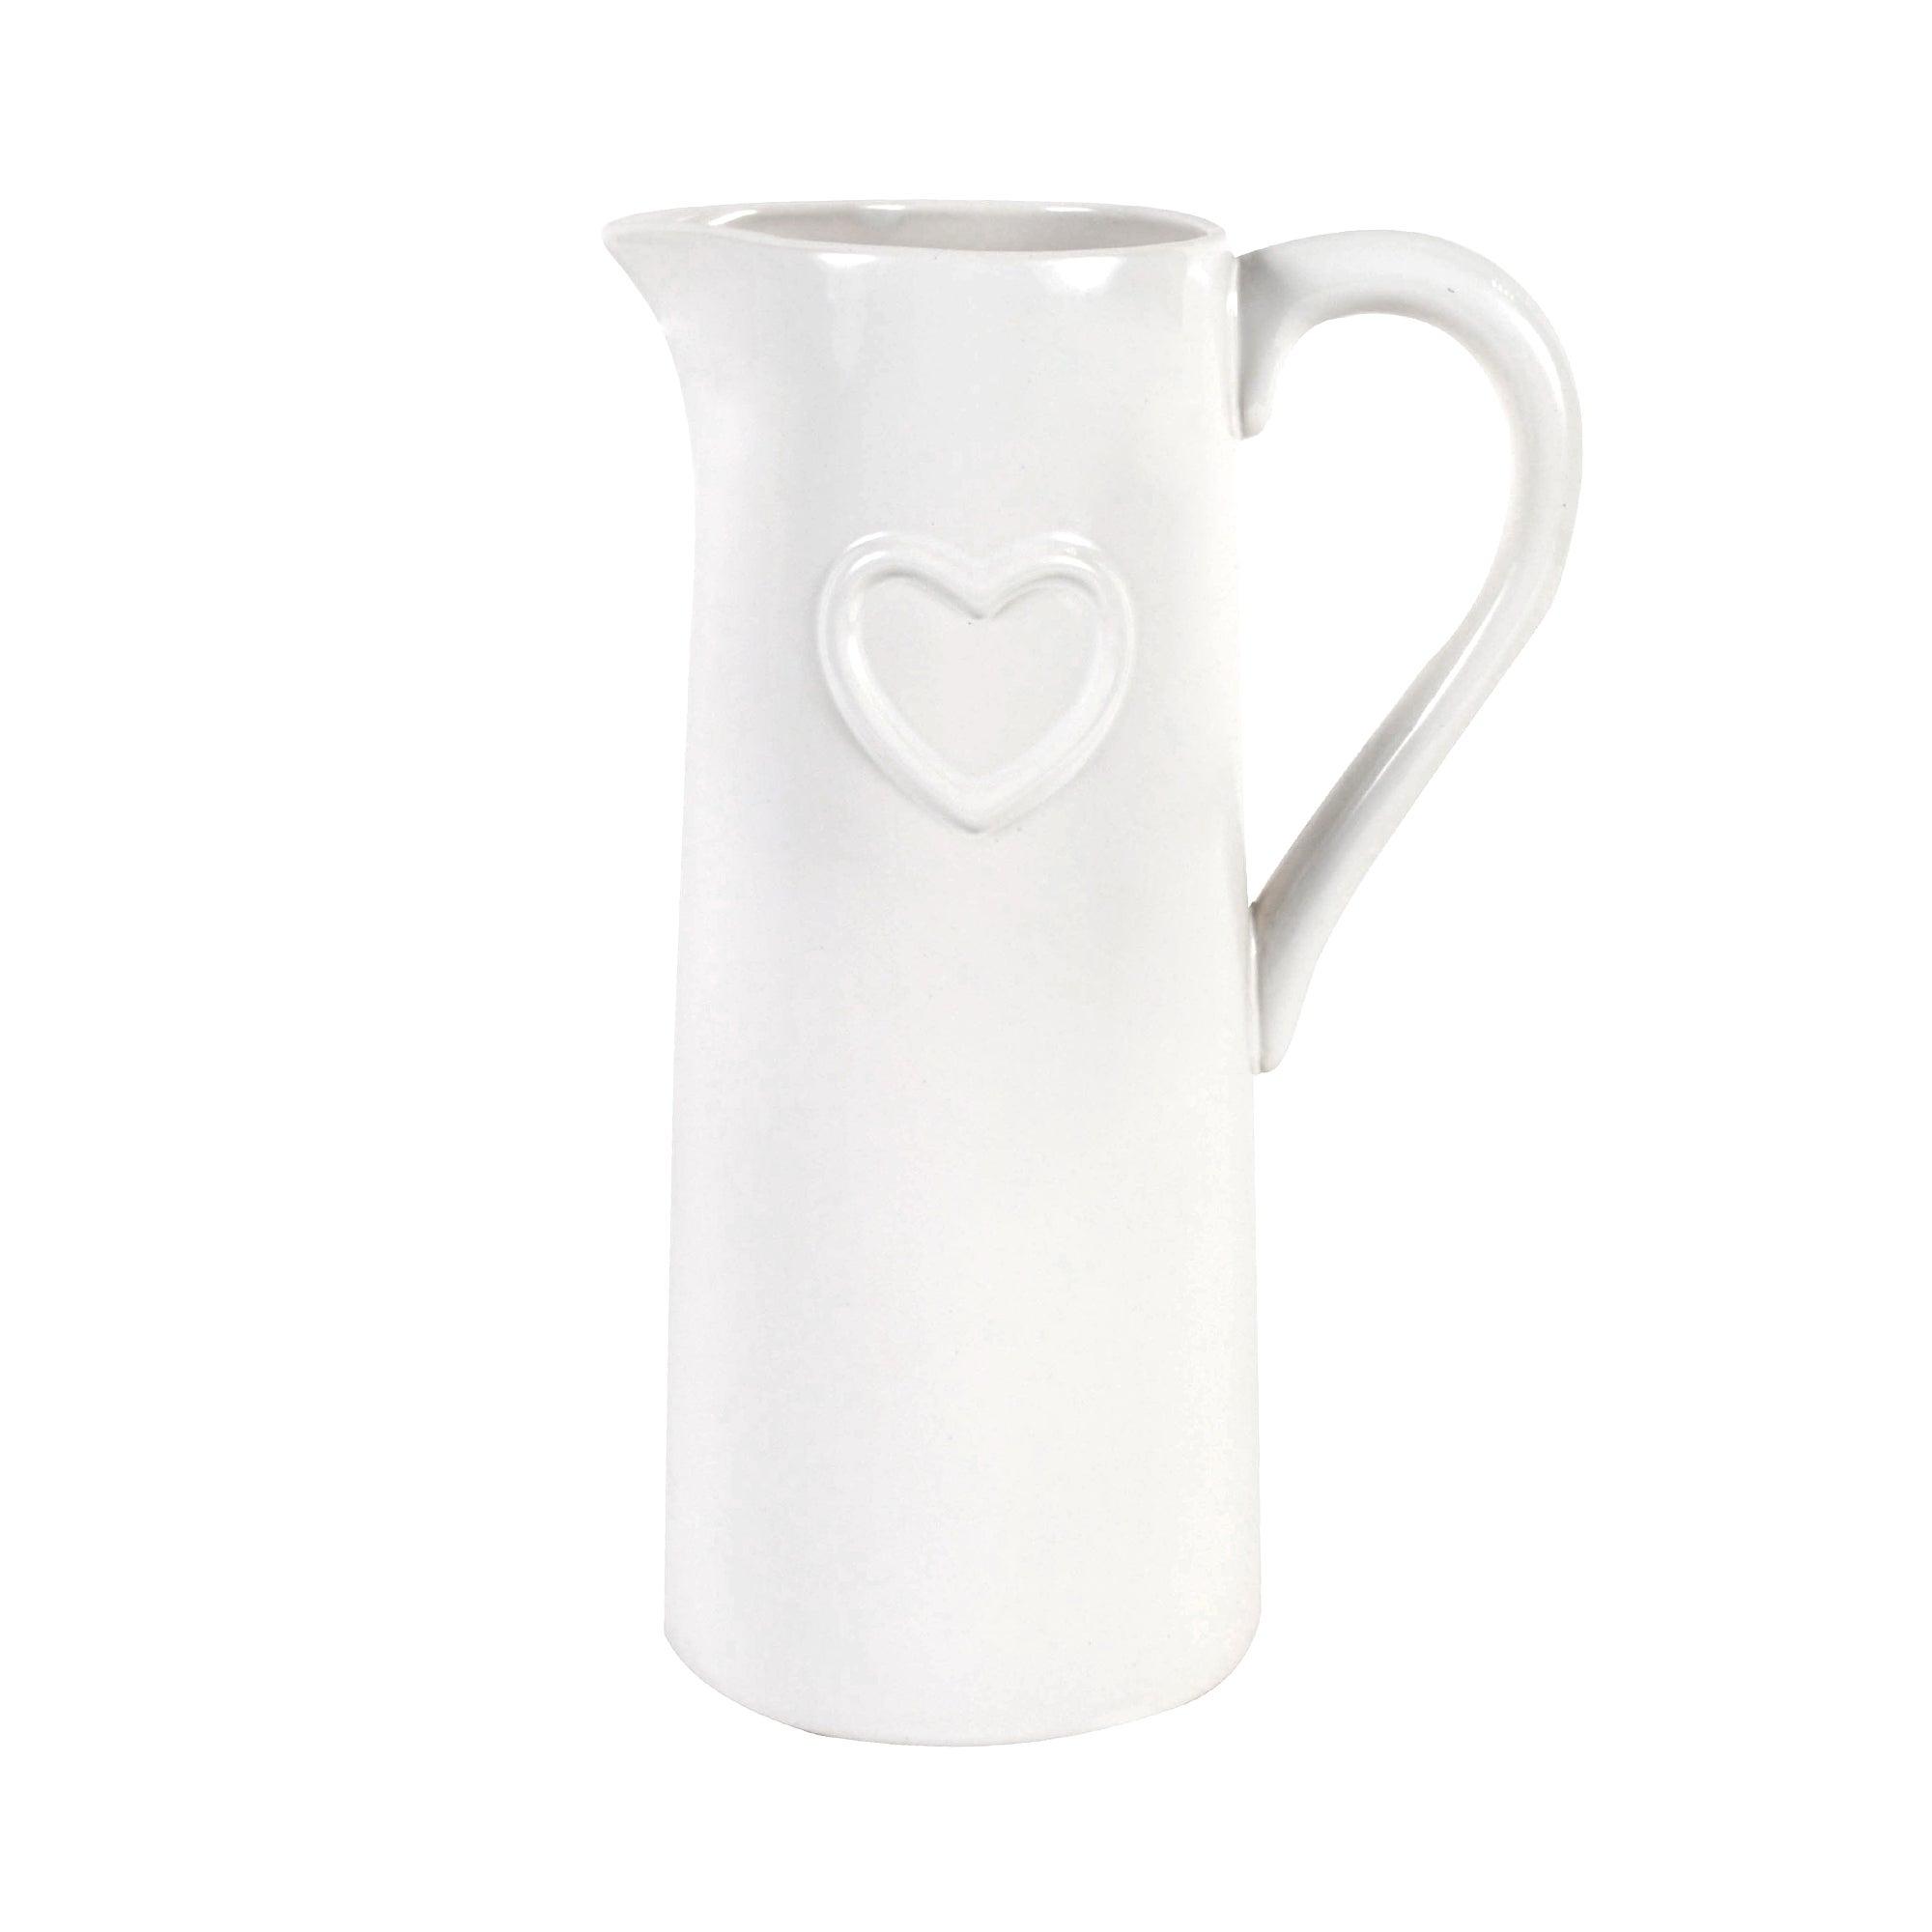 White Heart Jug Vase